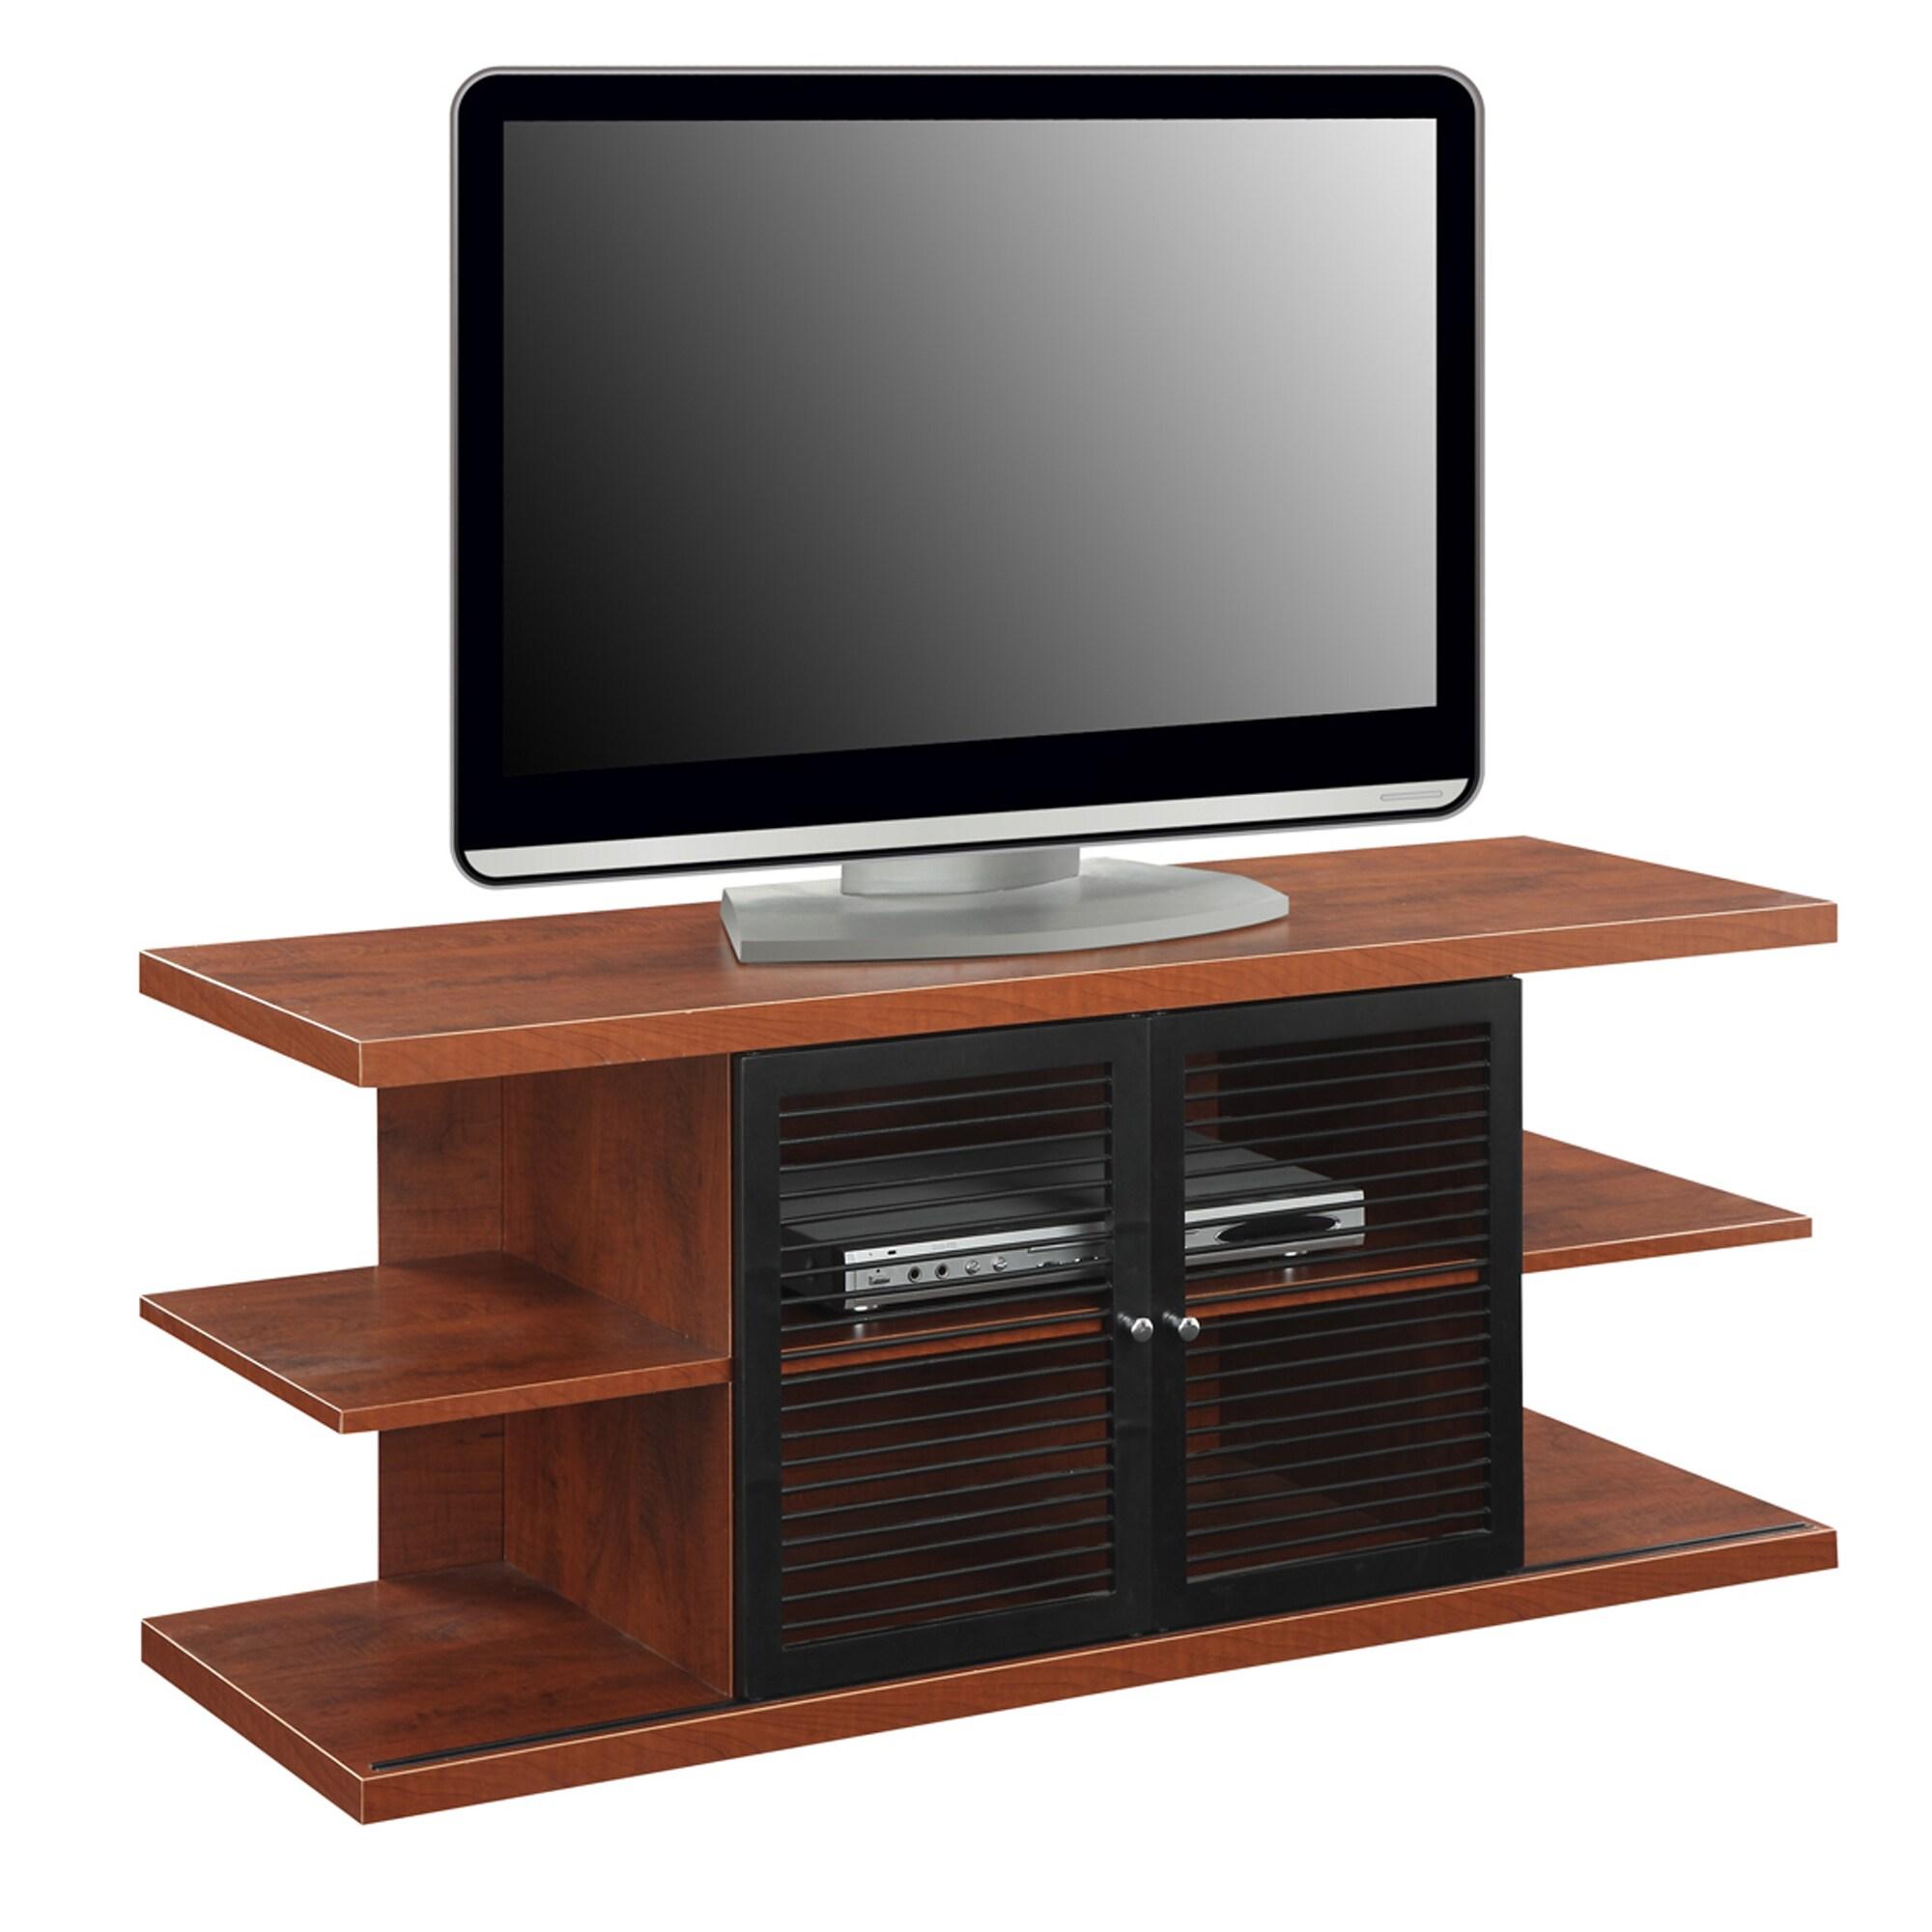 Shop Convenience Concepts Designs2go E Hampton Tv Stand On Sale